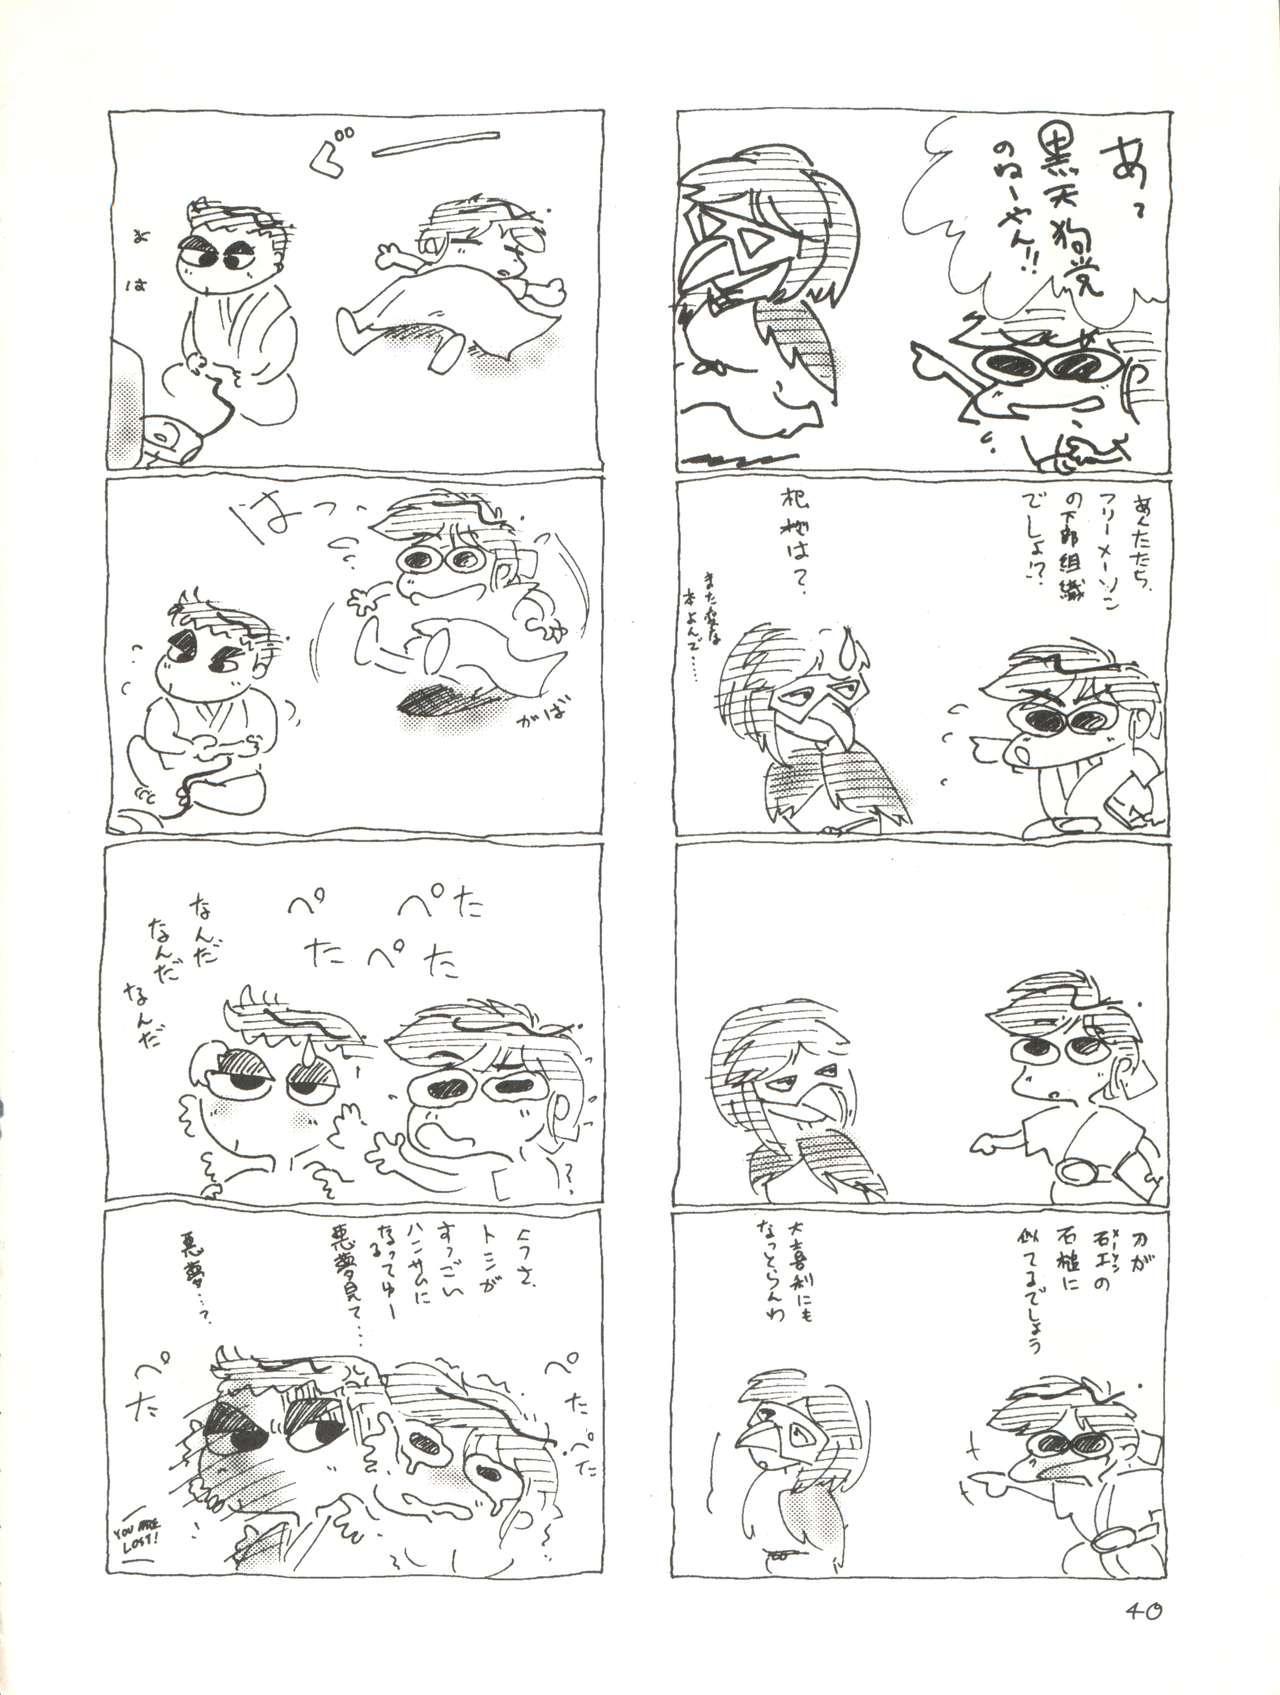 Kaiketsu Spats 39